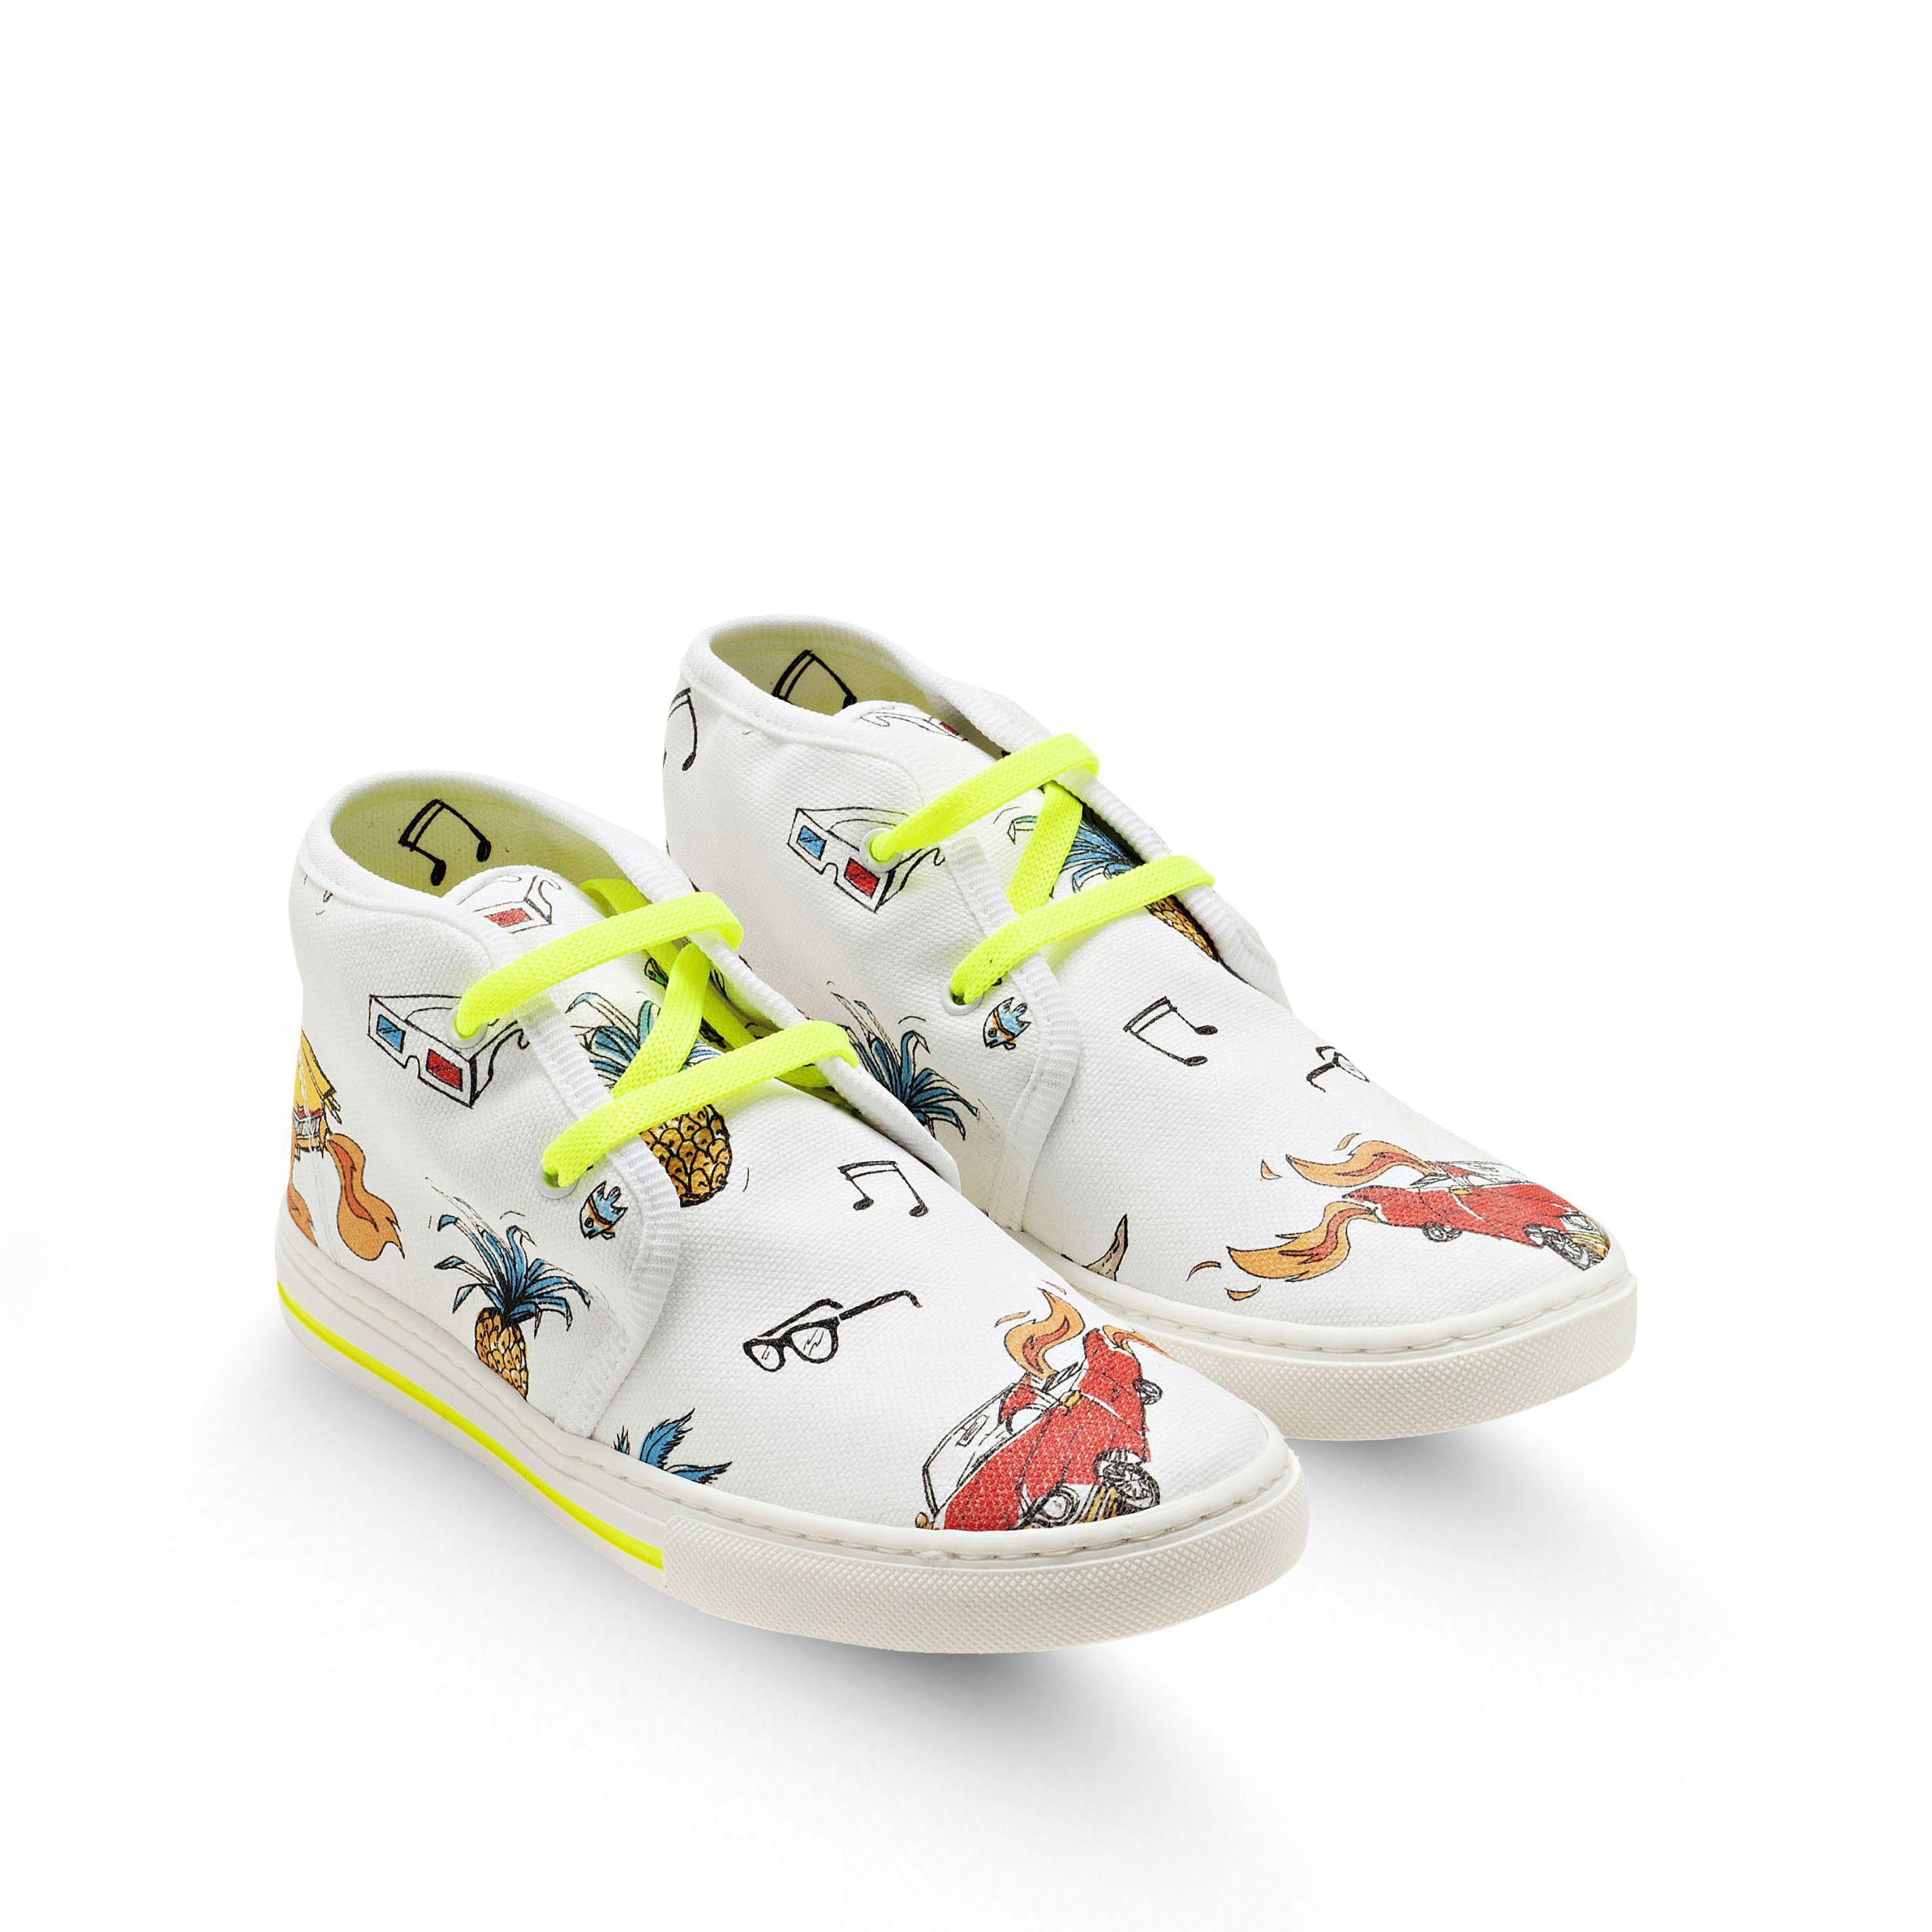 Boys's STELLA McCARTNEY KIDS Shoes